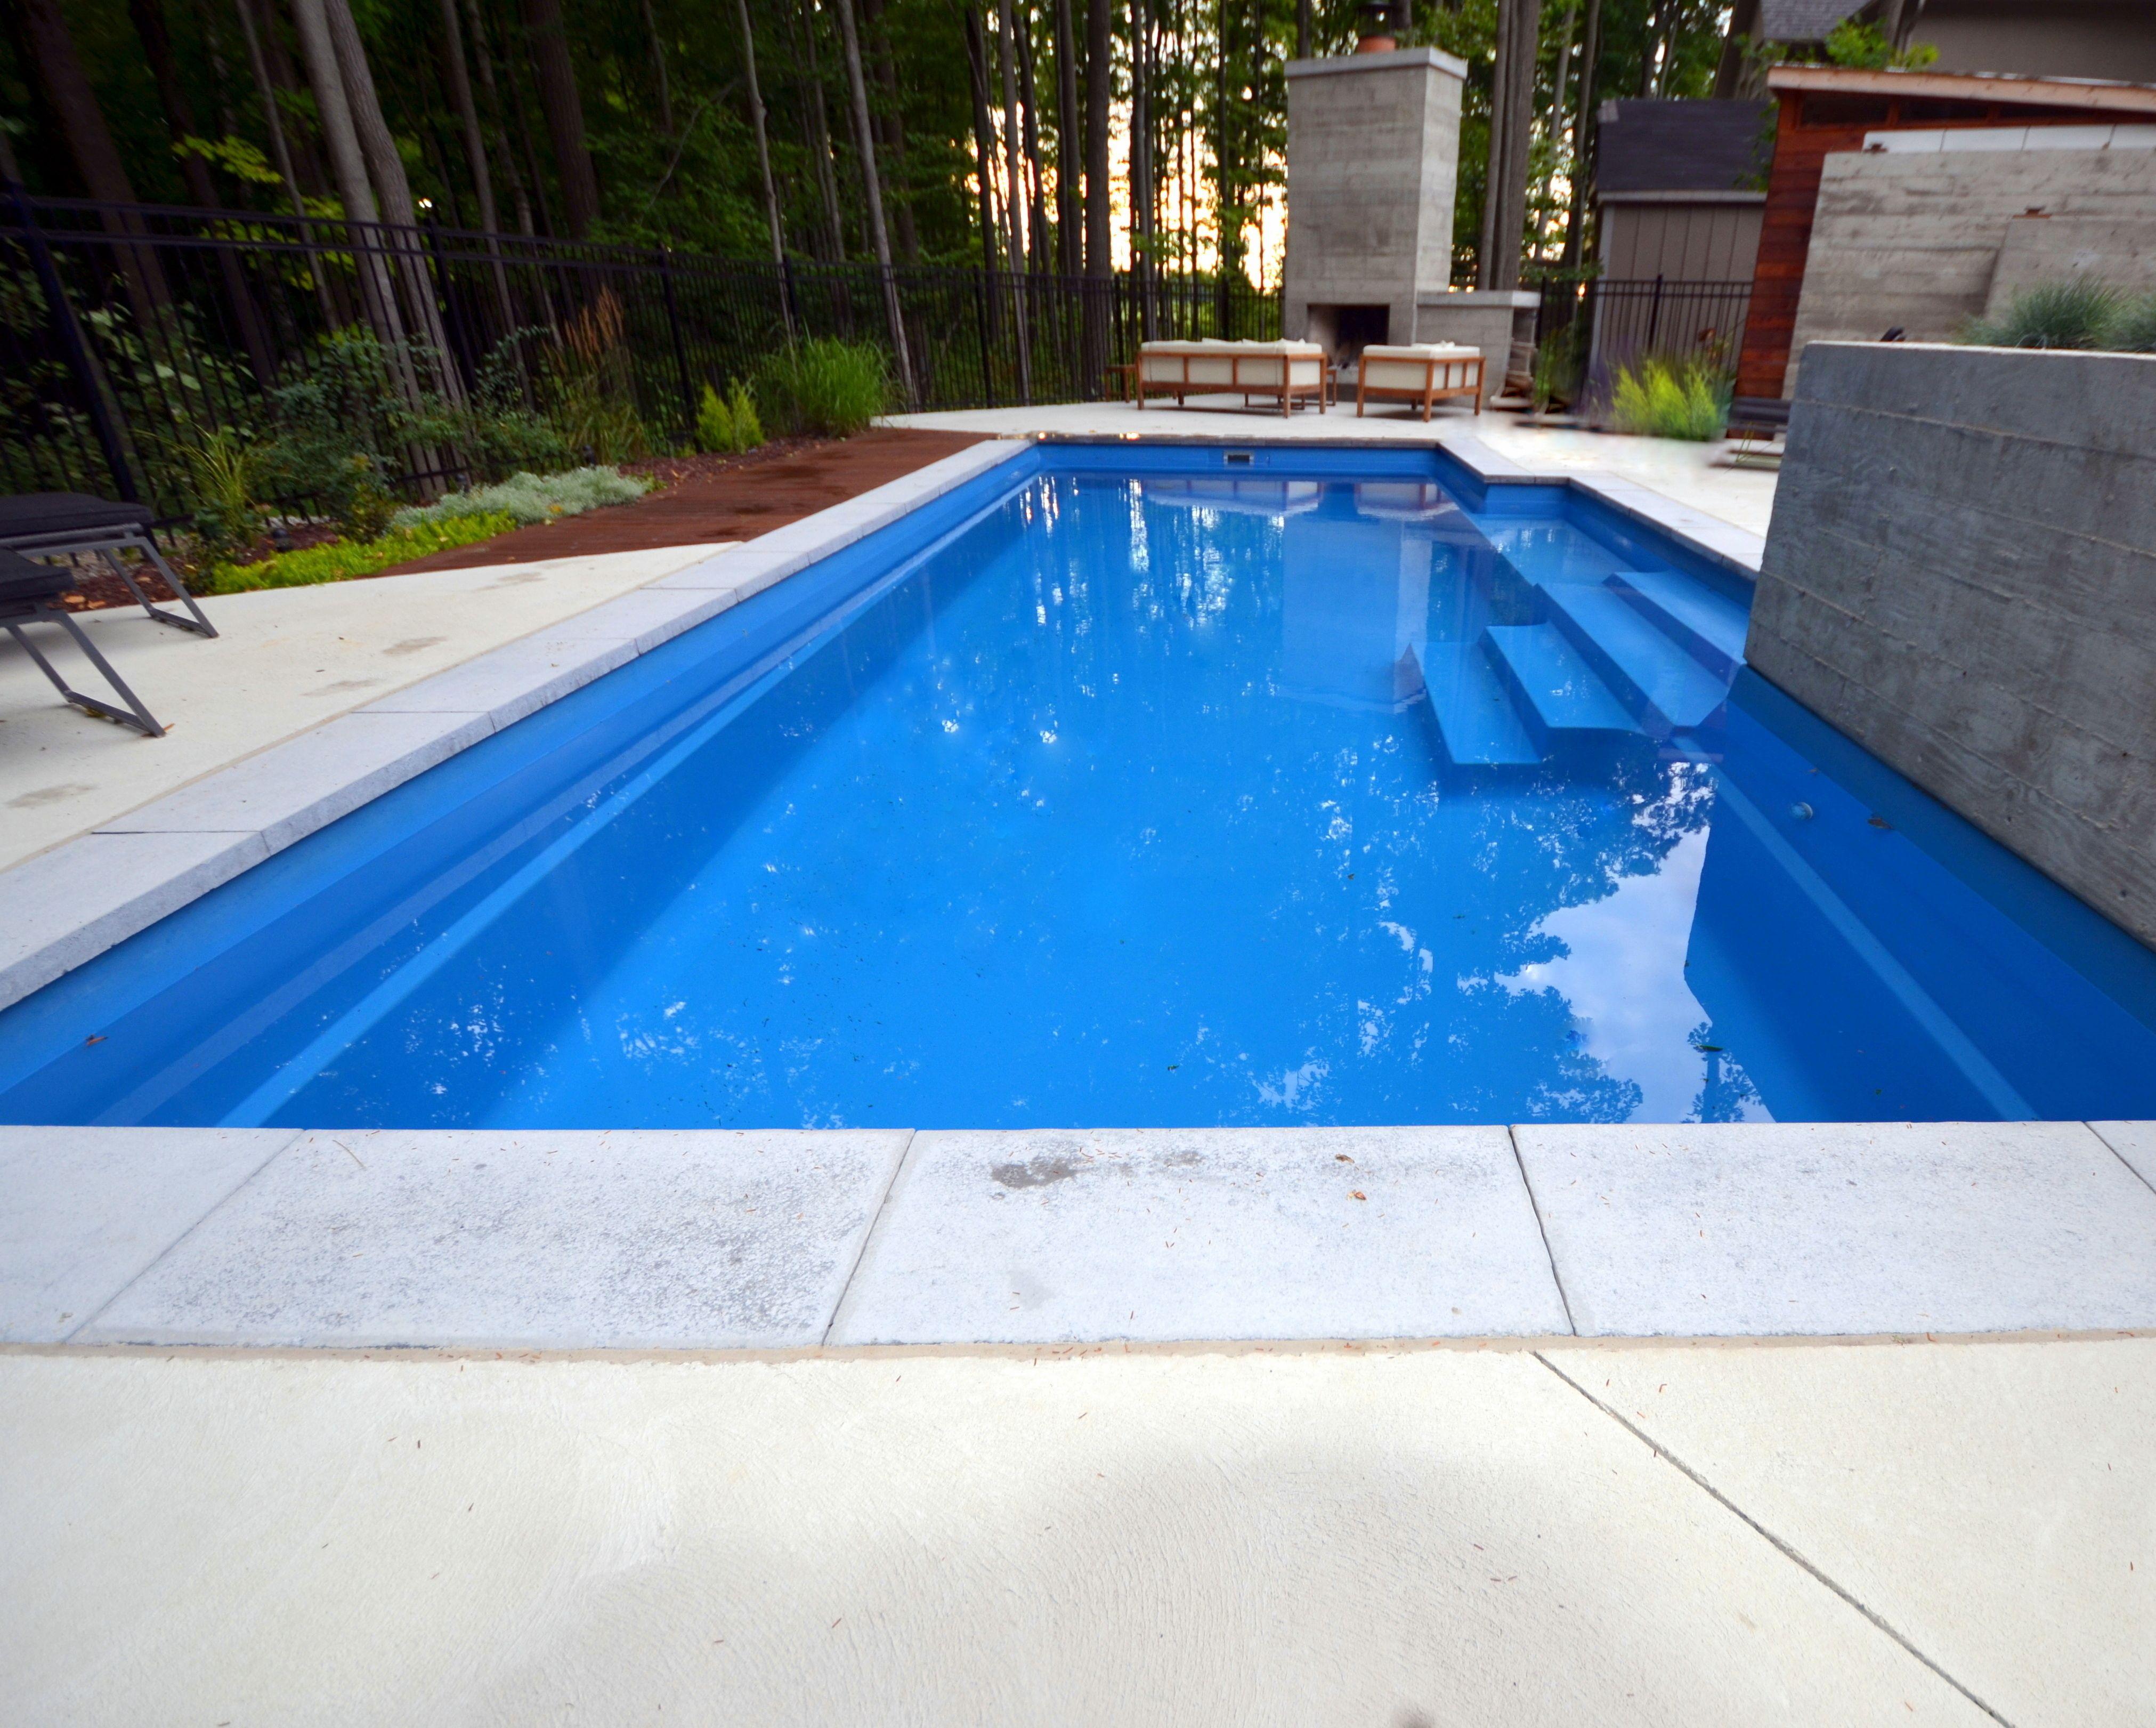 Natural Stone Coping On A Fiberglass Pool With Concrete Patio Pool Paving Pool Shapes Fiberglass Pools